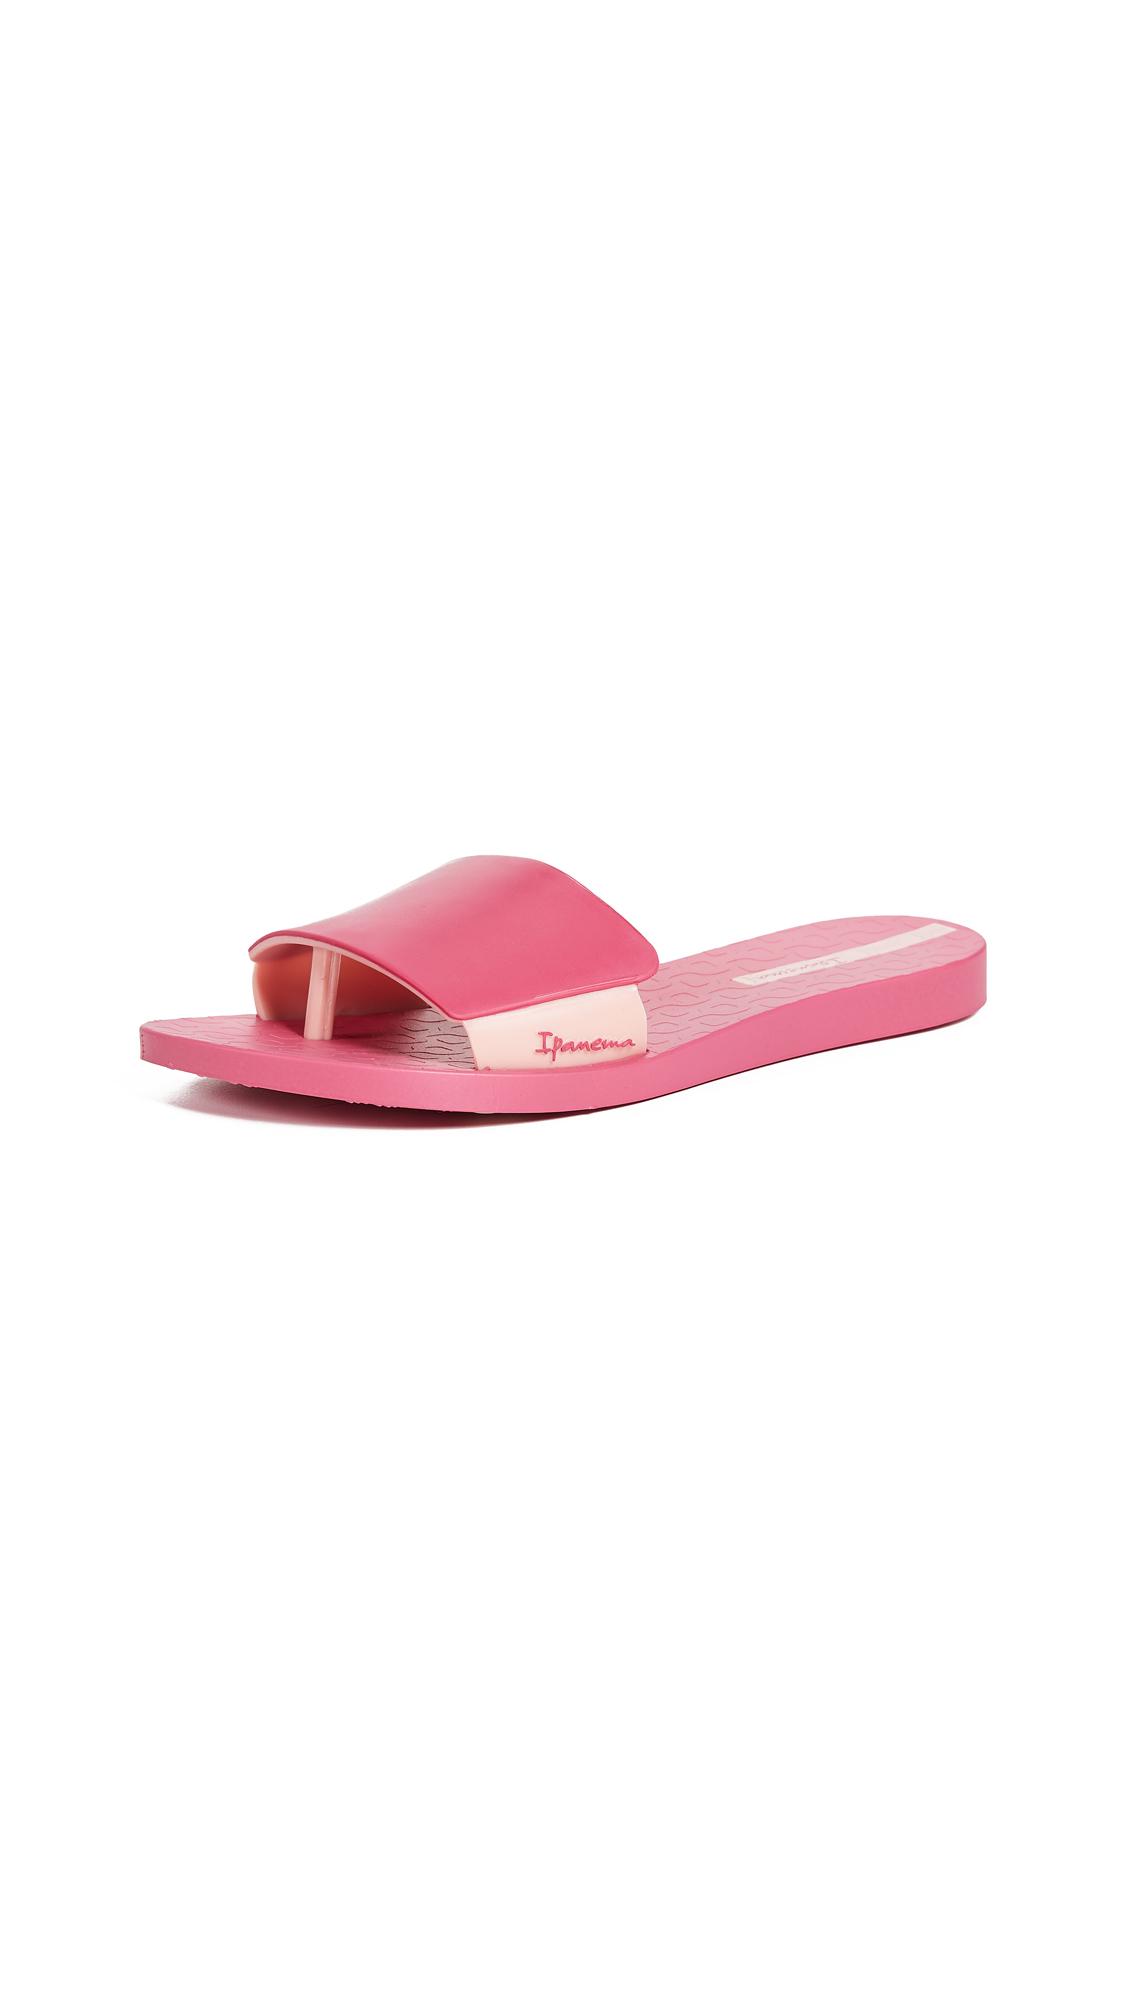 Ipanema Livia Slides - Pink